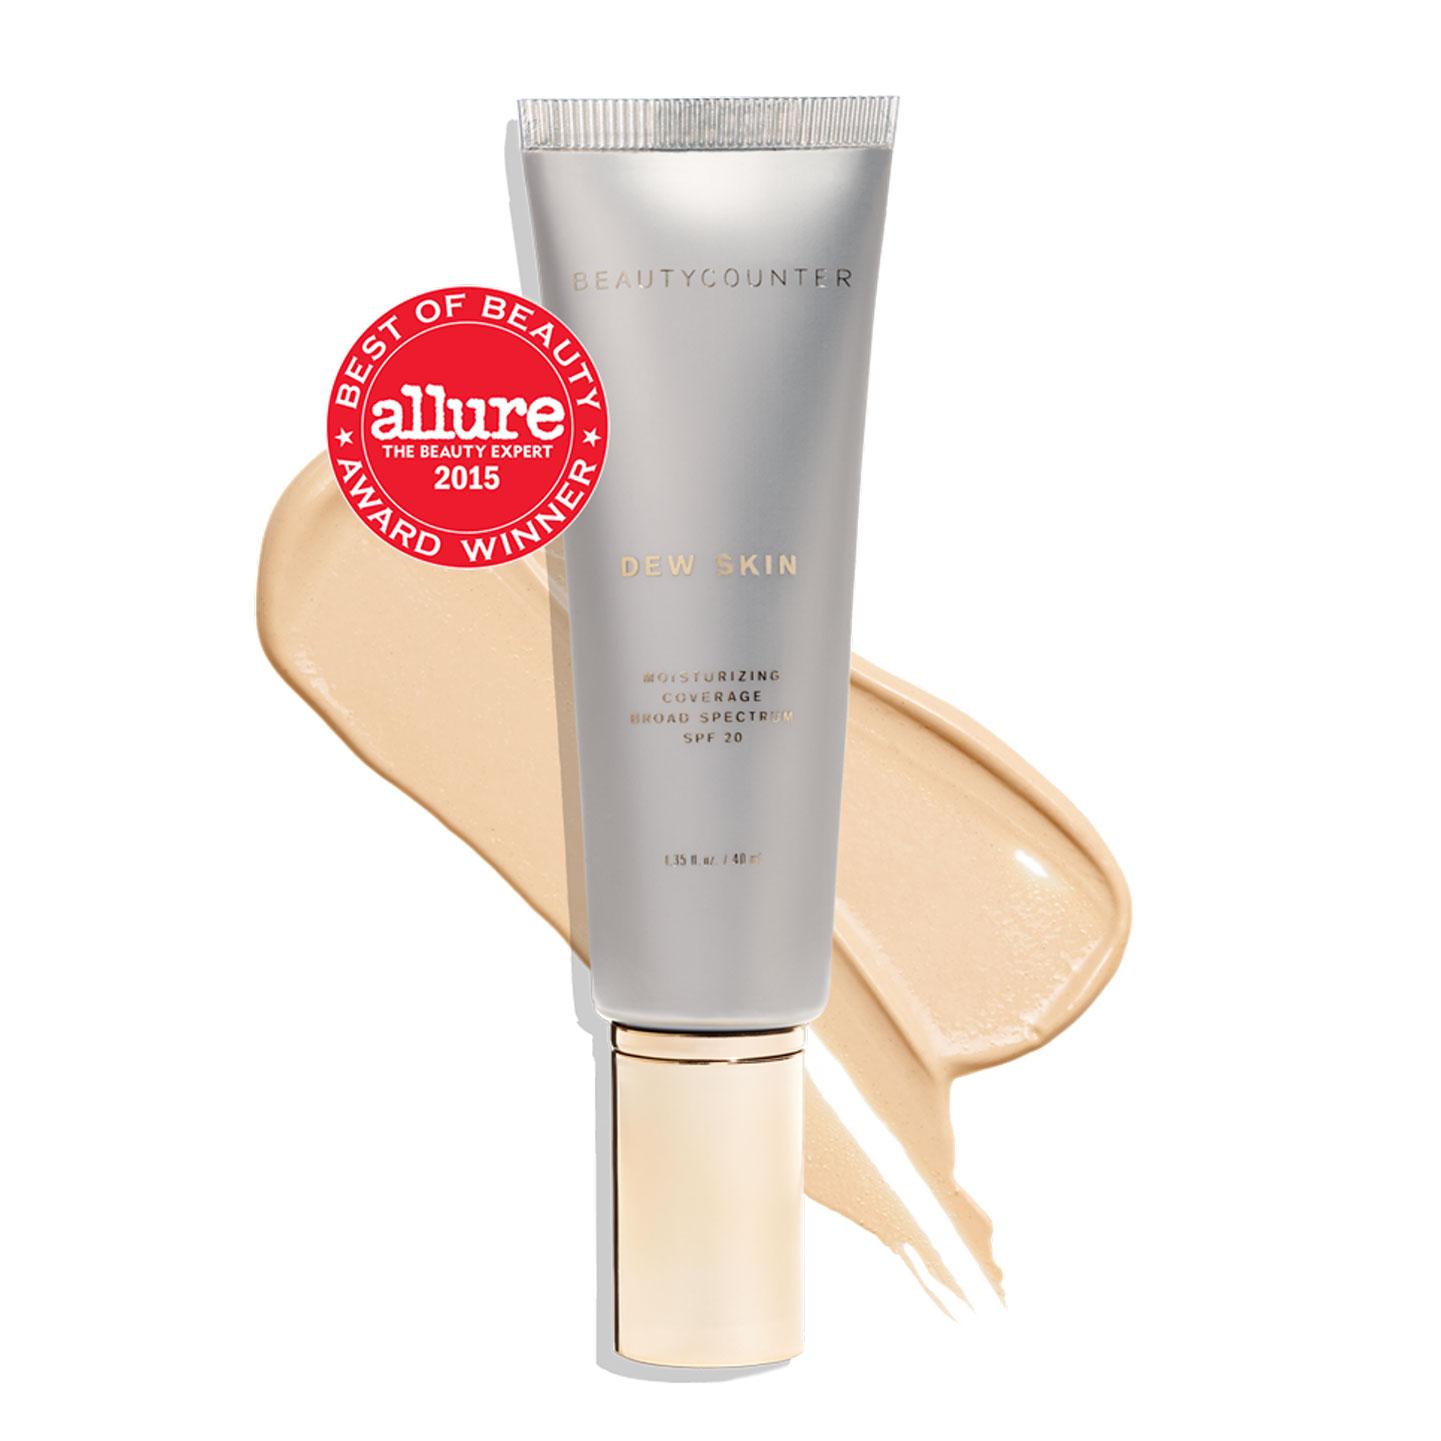 Beautycounter's Dew Skin Moisturizing Coverage